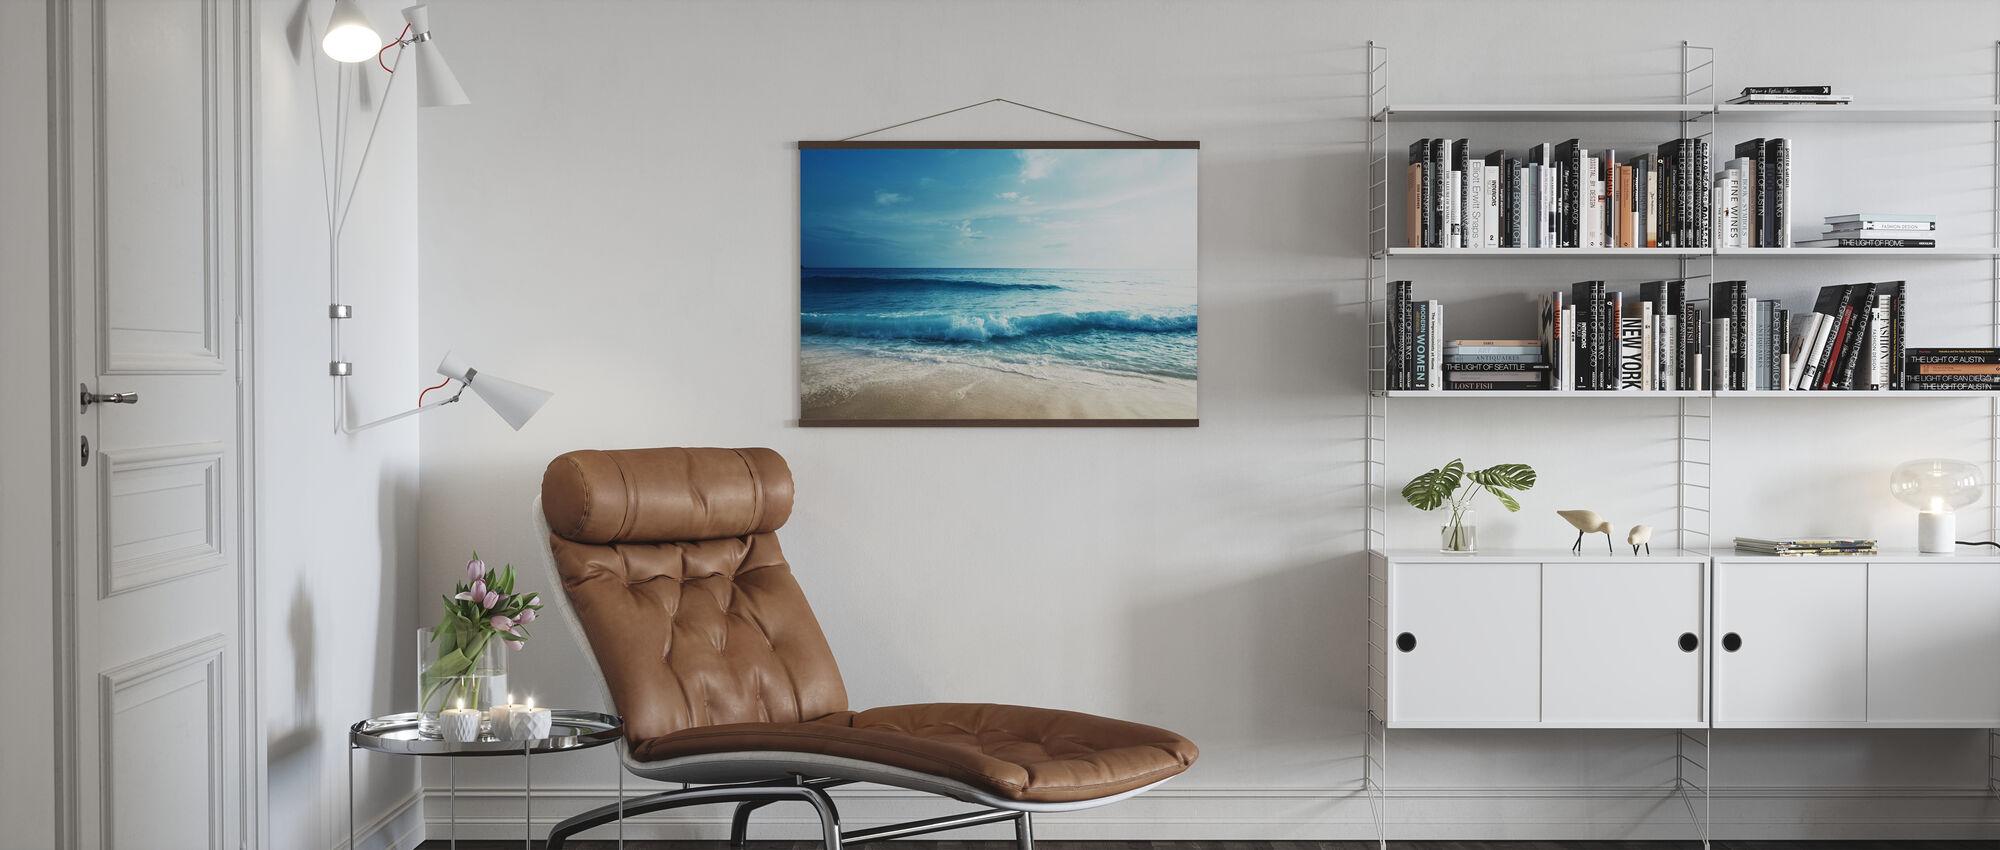 Seychelles Beach - Poster - Living Room